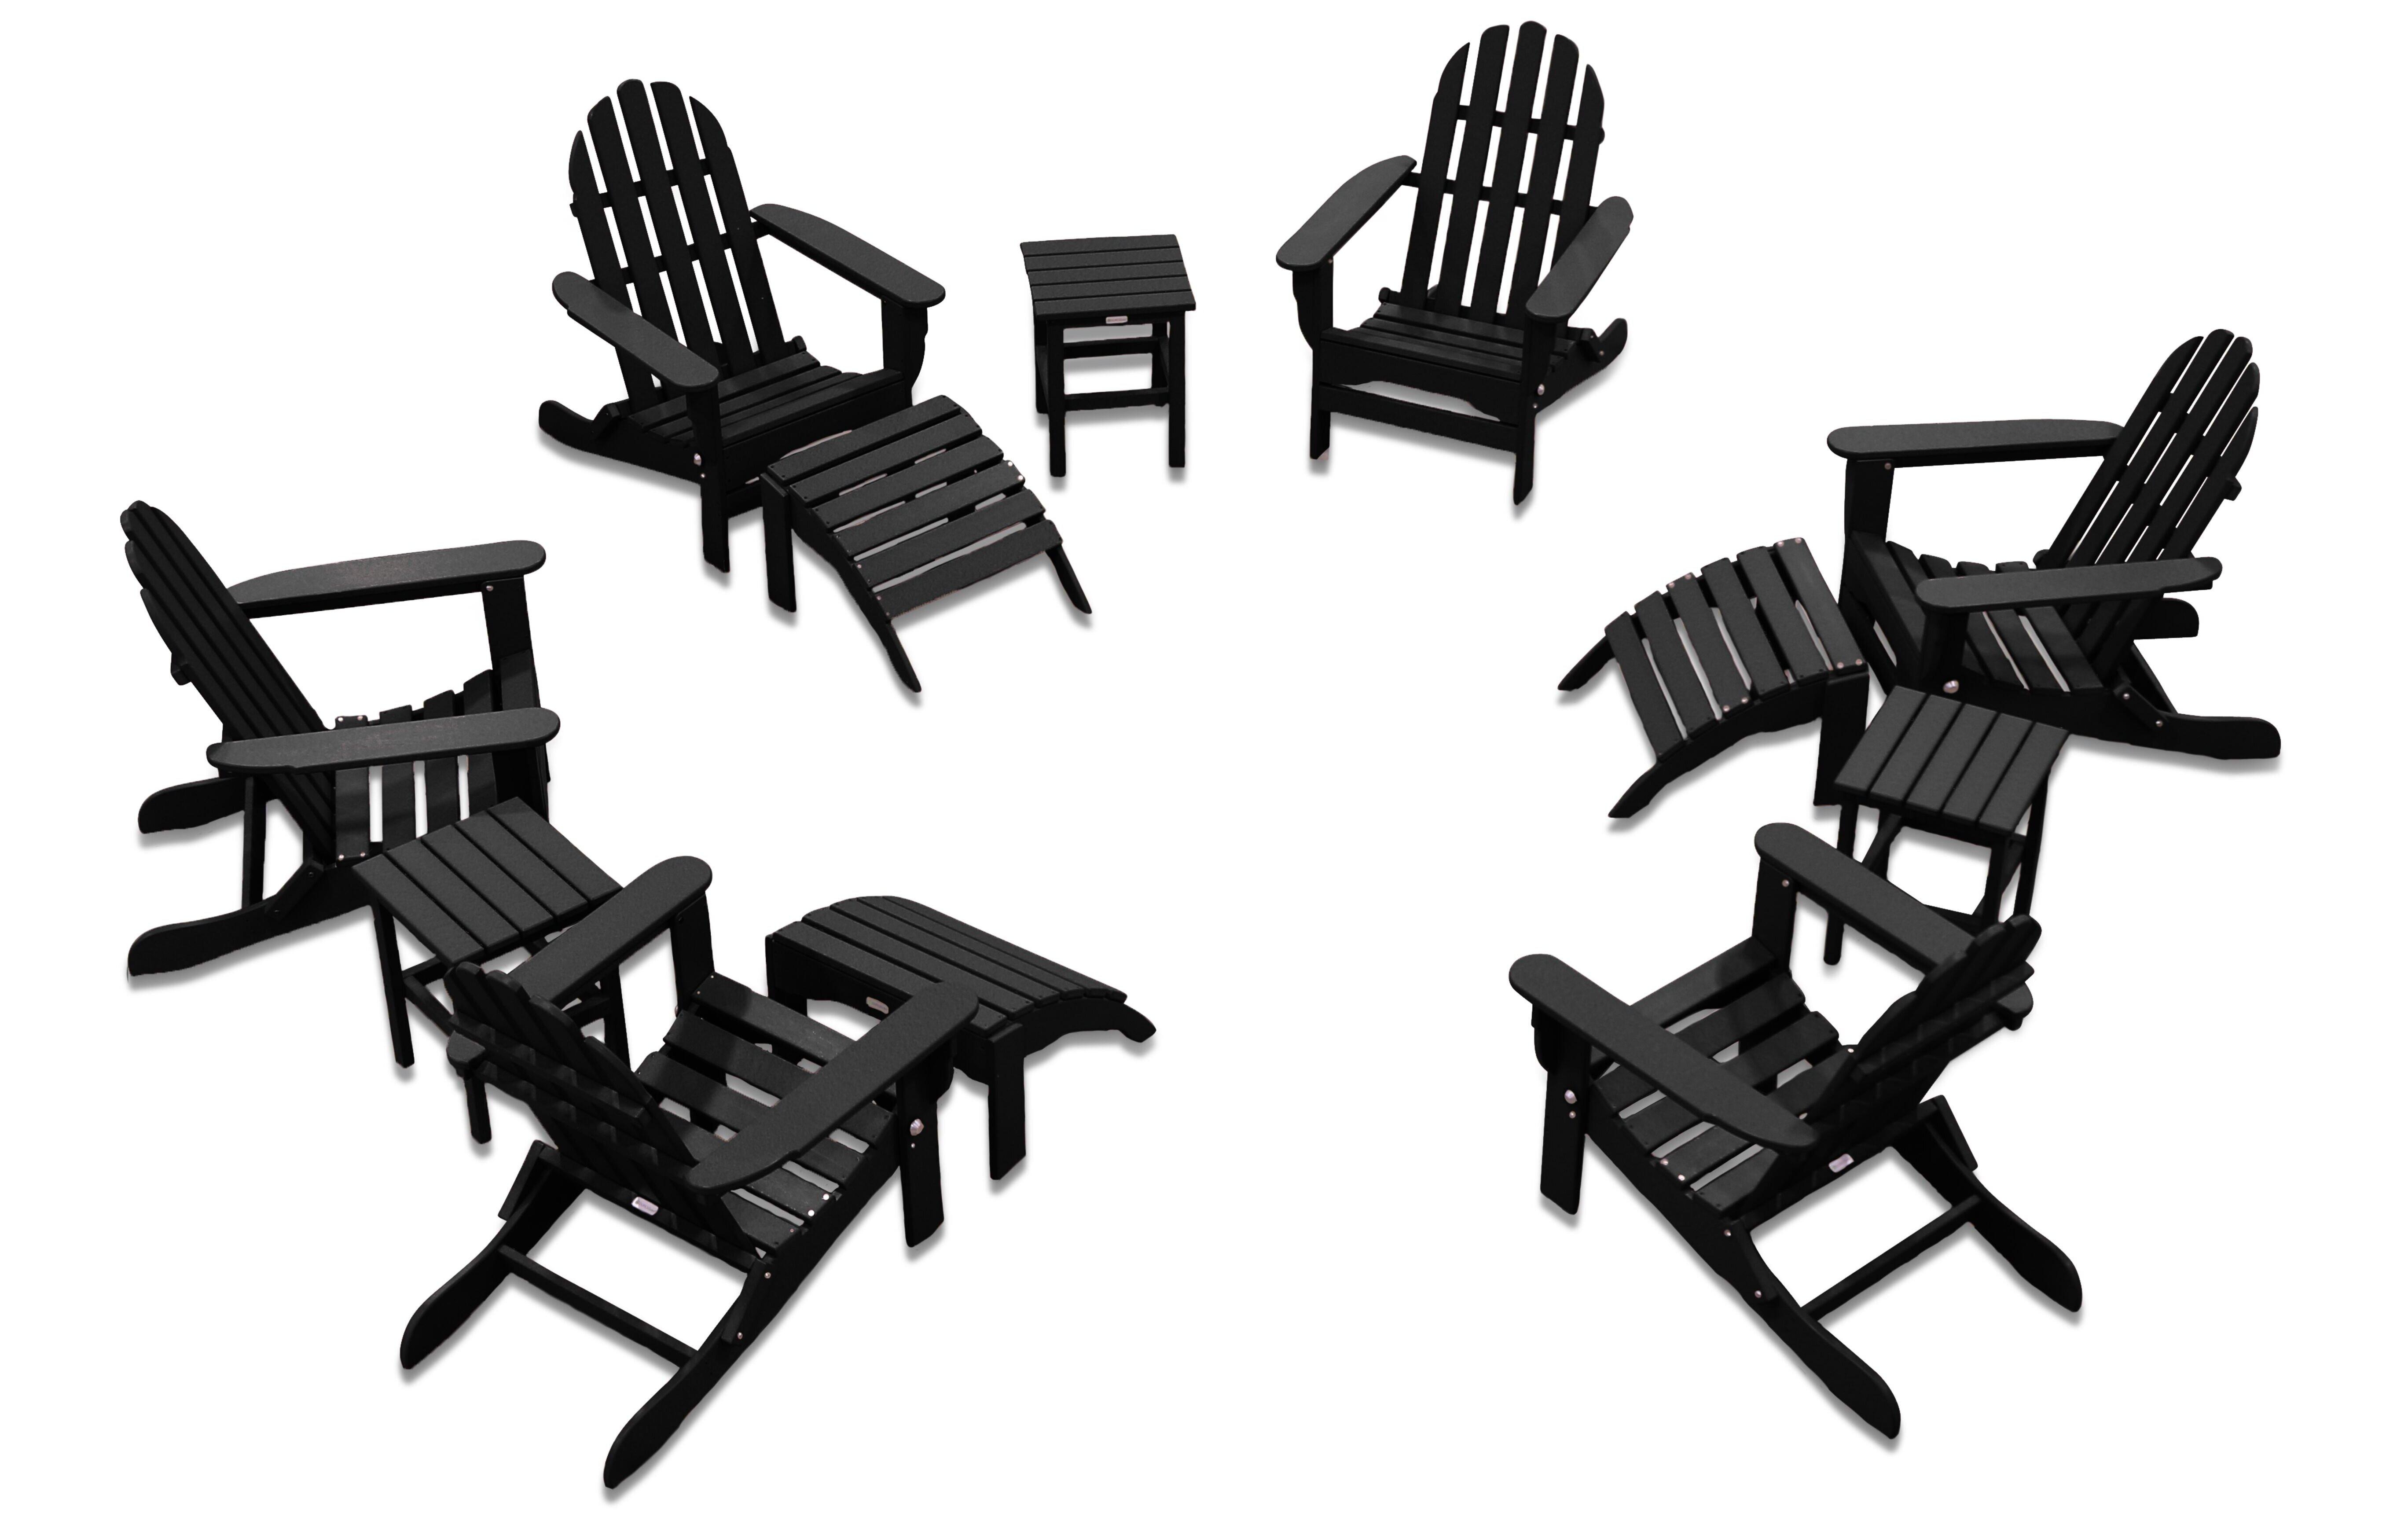 August Grove Keilson Plastic Resin Folding Adirondack Chair With Ottoman And Table Reviews Wayfair